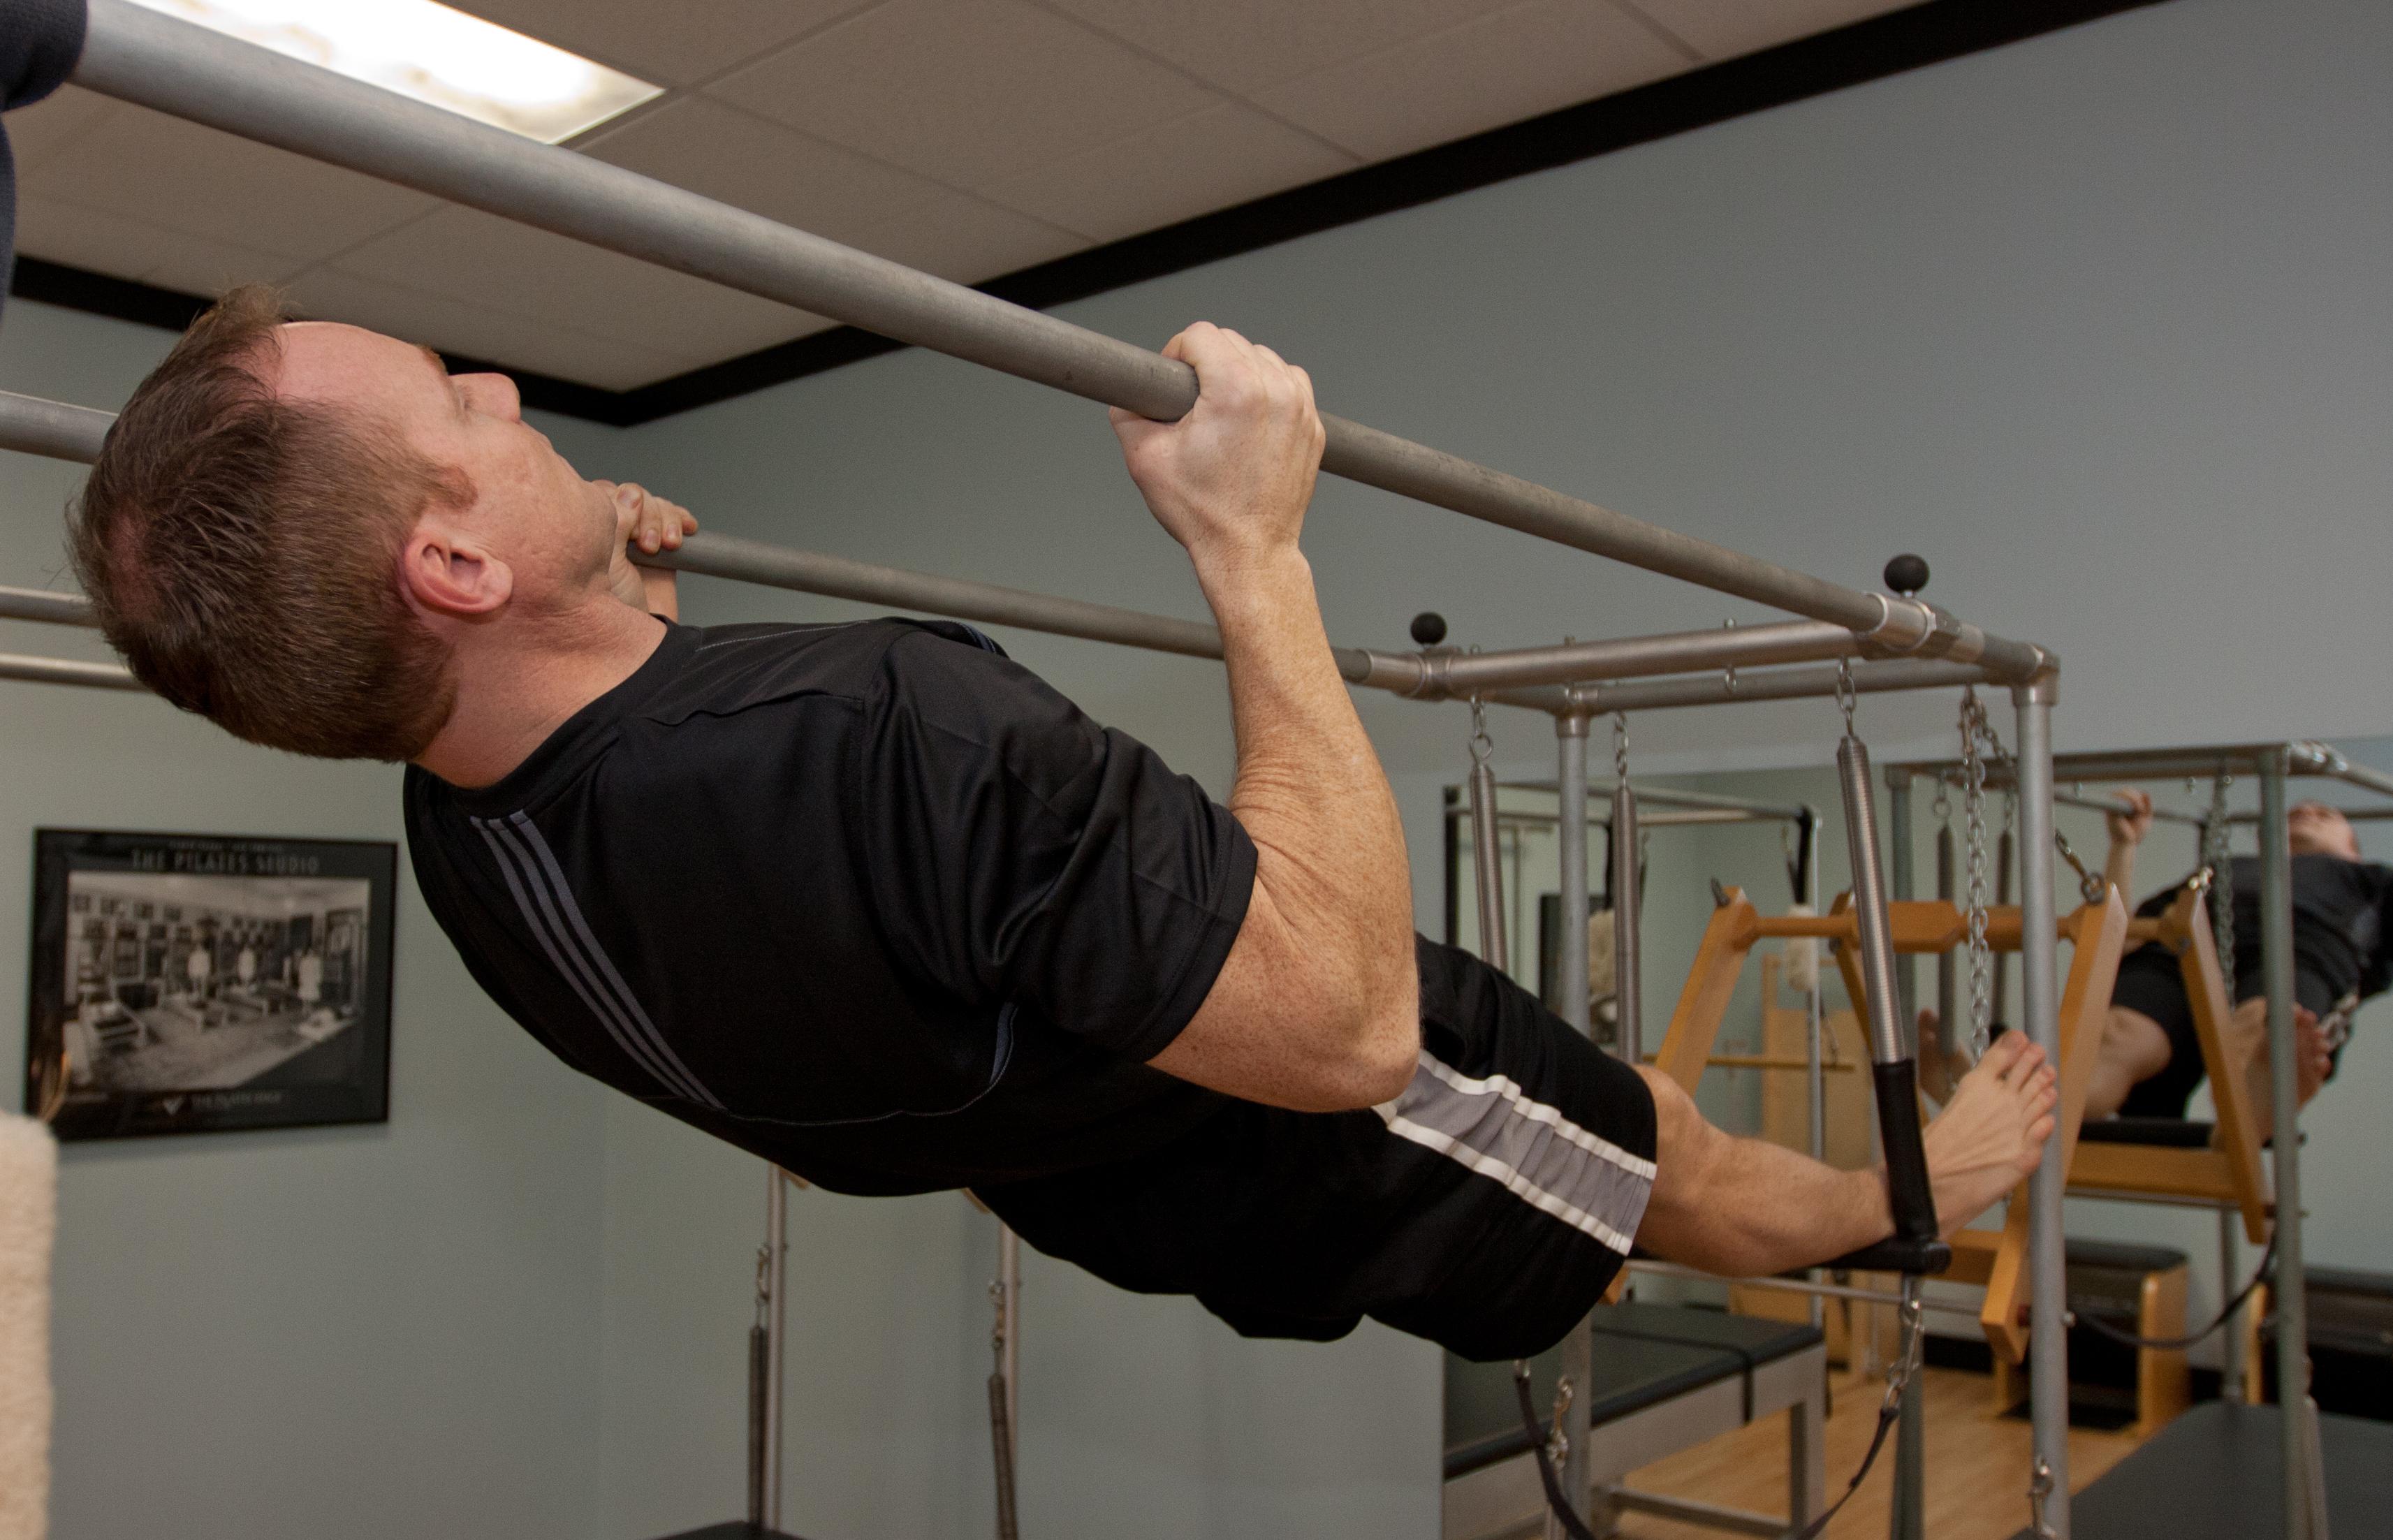 Hanging pullups